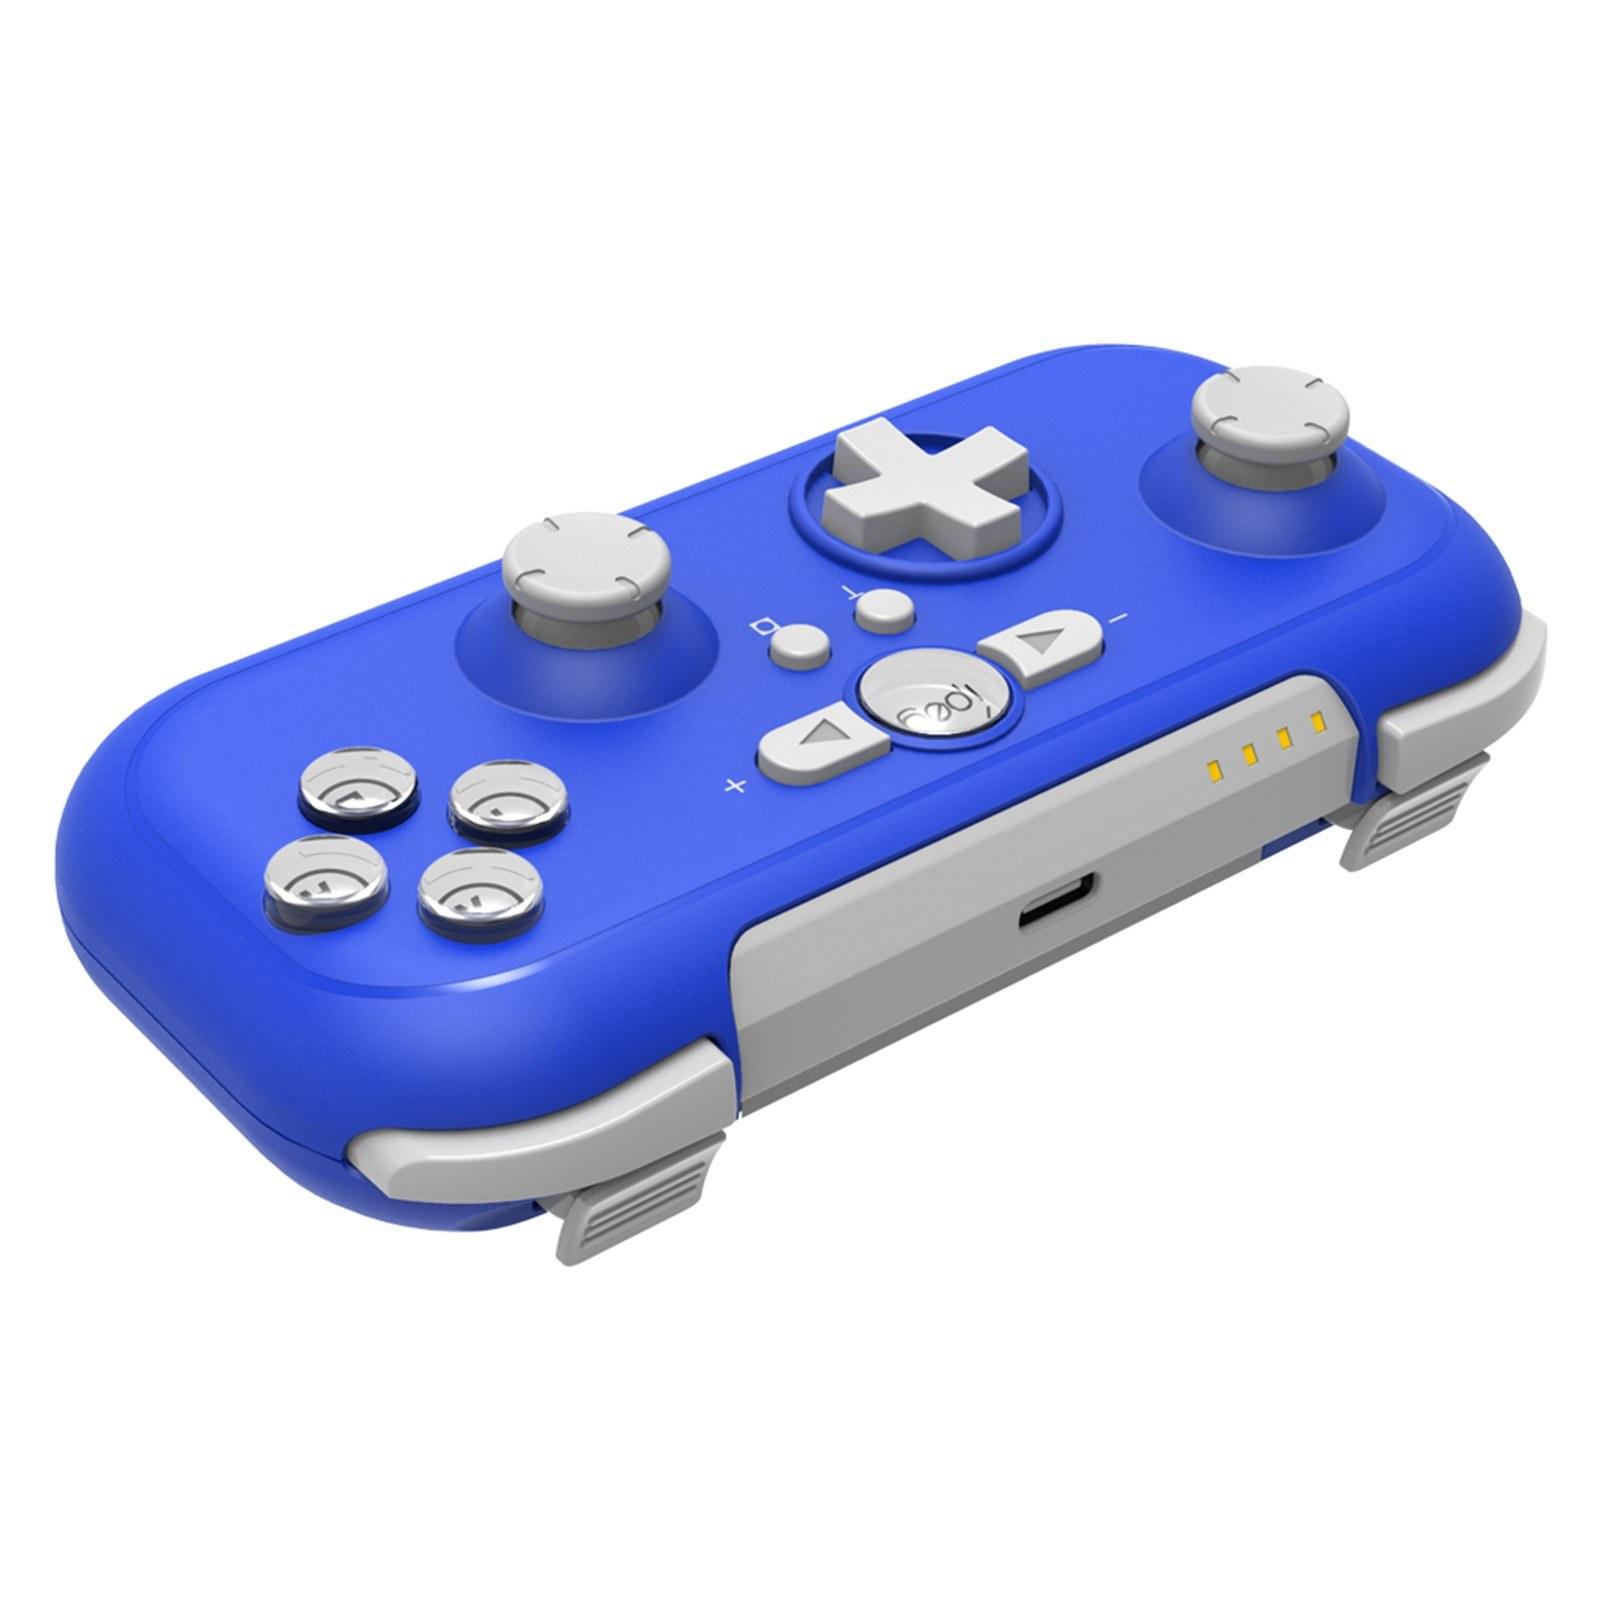 cafago.com - 61% OFF iPega PG-SW021 Mini Wireless Game Controller,free shipping+$21.19